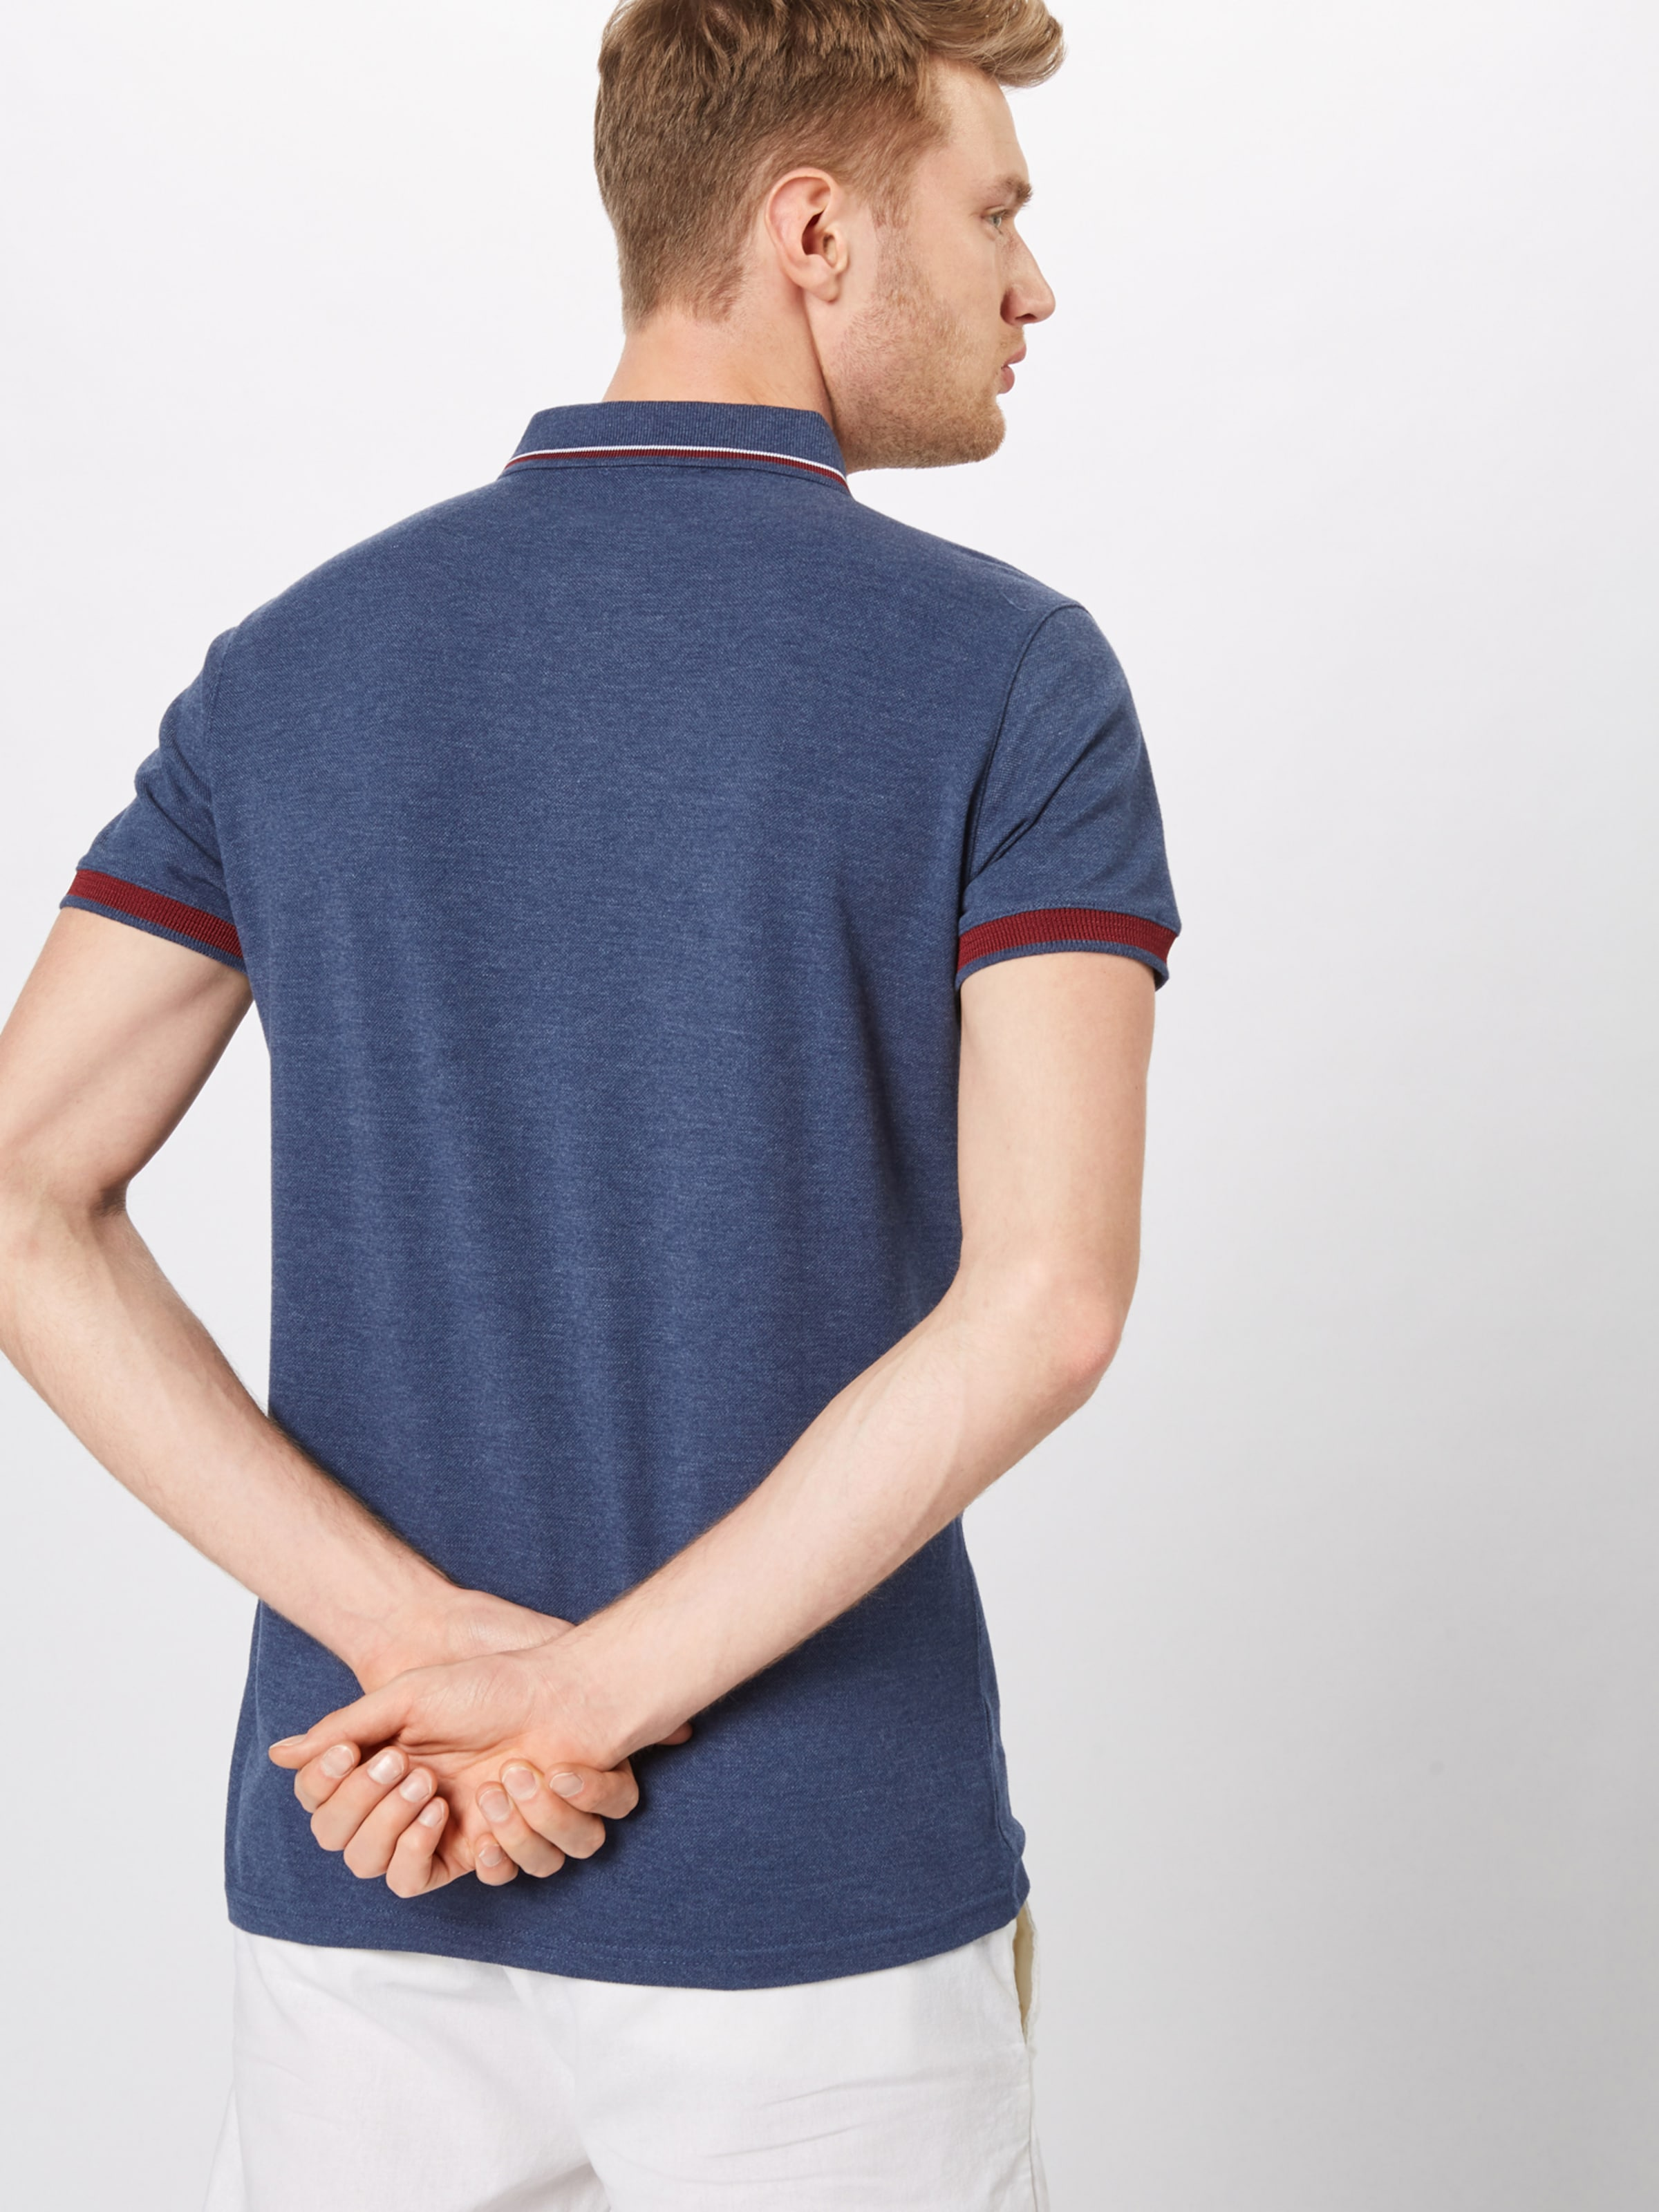 T Blanc 'misaji' shirt En Ltb 0wPX8nOk